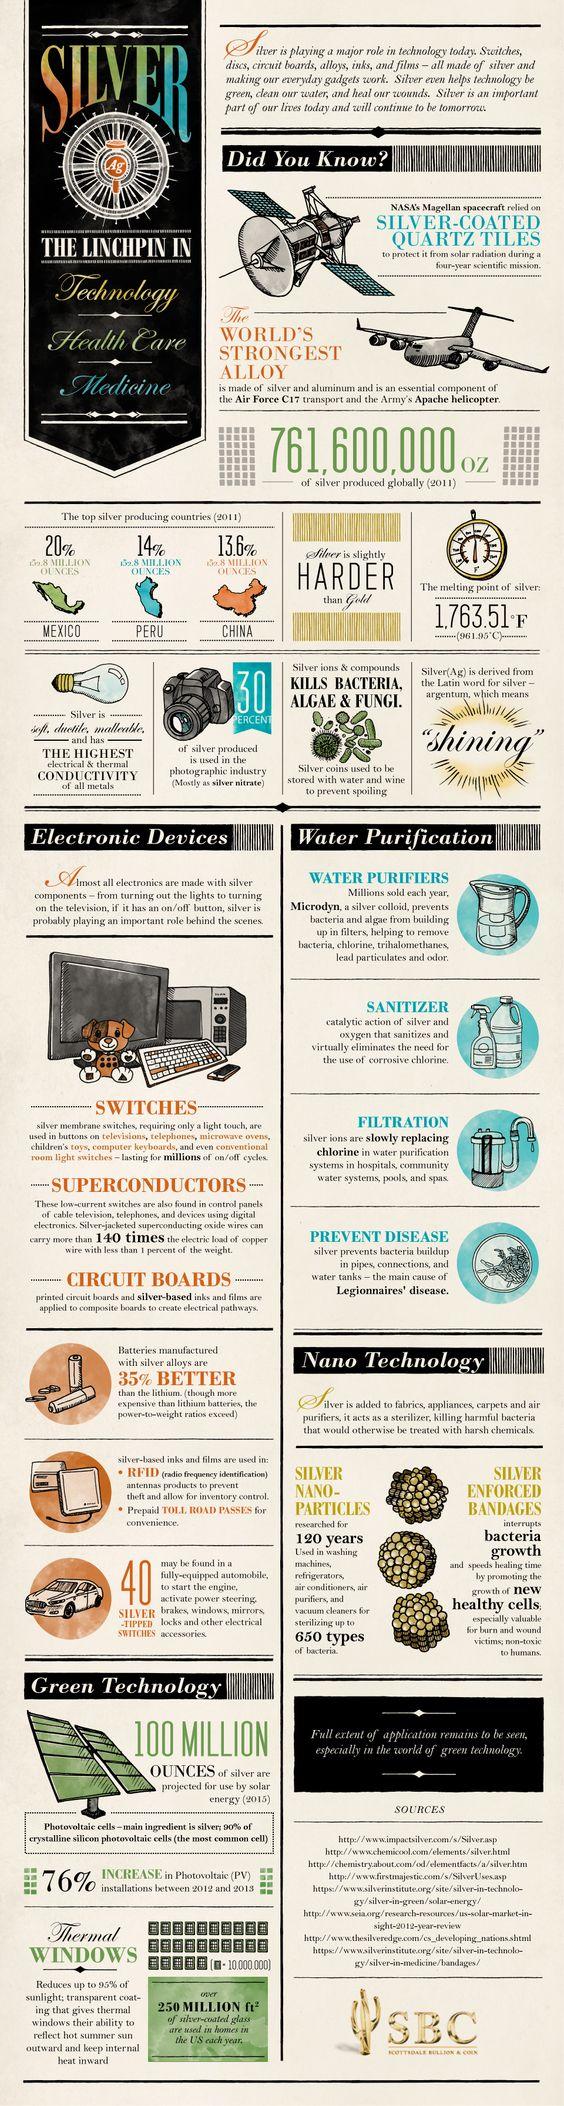 Best infographic on Silver  http://www.tradingprofits4u.com/